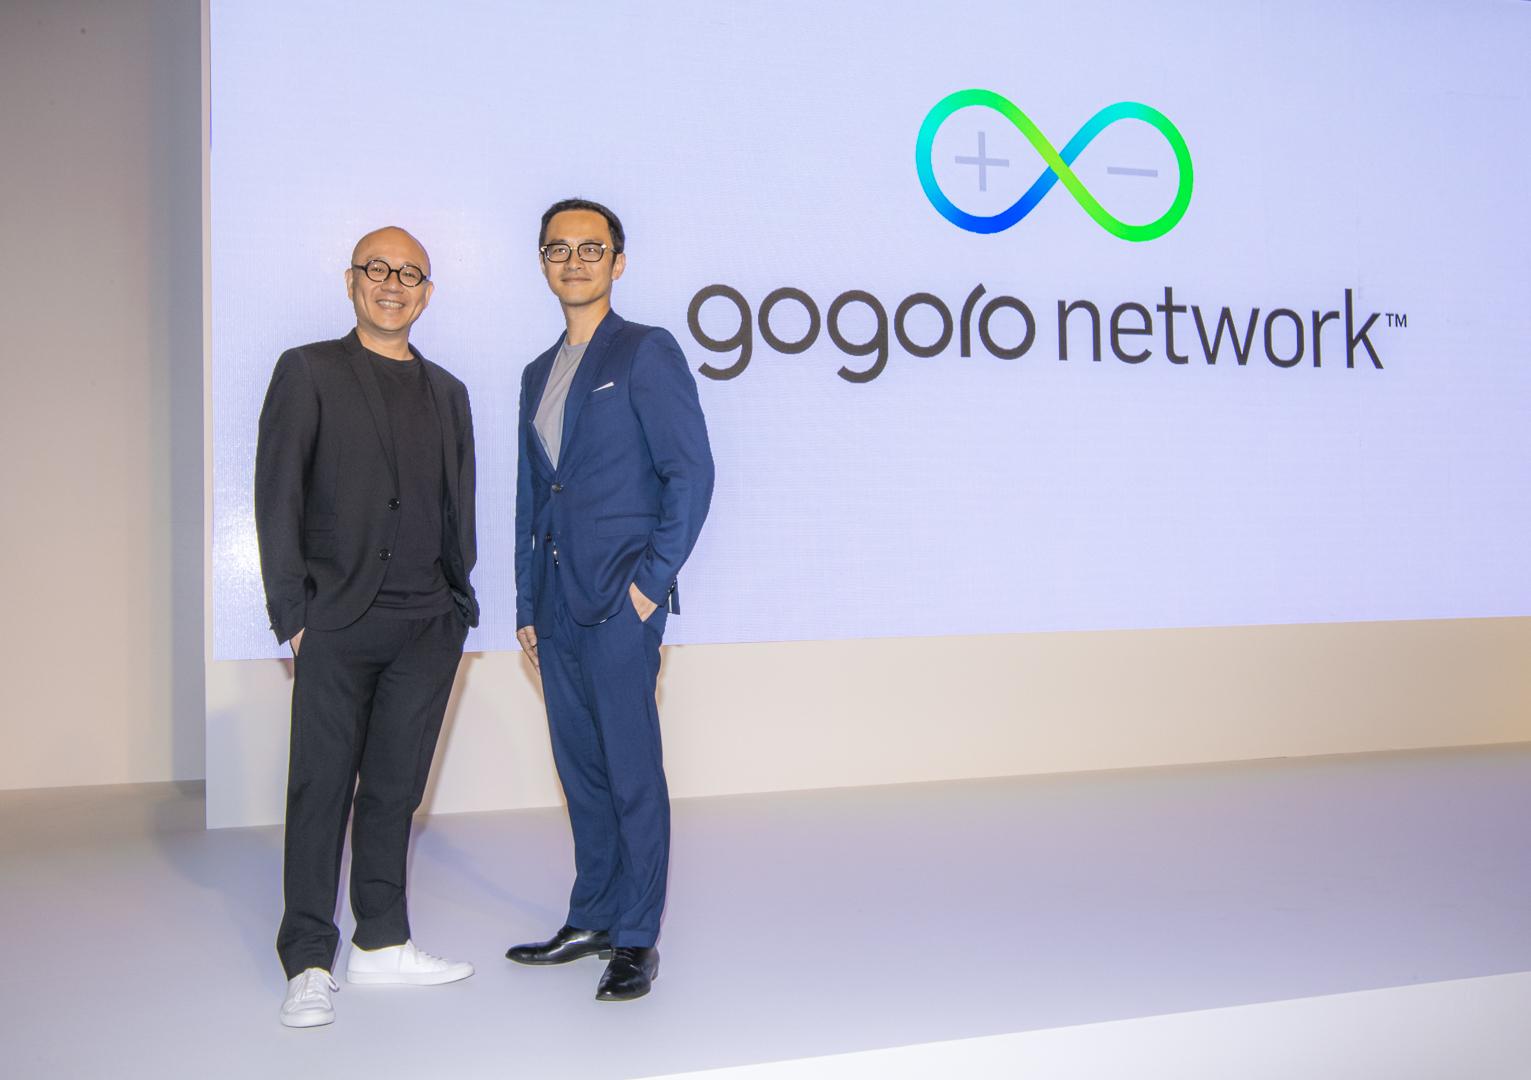 Gogoro 執行長暨創辦人陸學森和 Gogoro Network 總經理潘璟倫表示:「今日發表創新的「自由省」電池服務資費方案:不僅依照大數據即時智慧分析,透過動態折價平衡網路供需,更免費贈送「性能提升服務」,讓所有用戶都享有更彈性、聰明的額外選擇。」